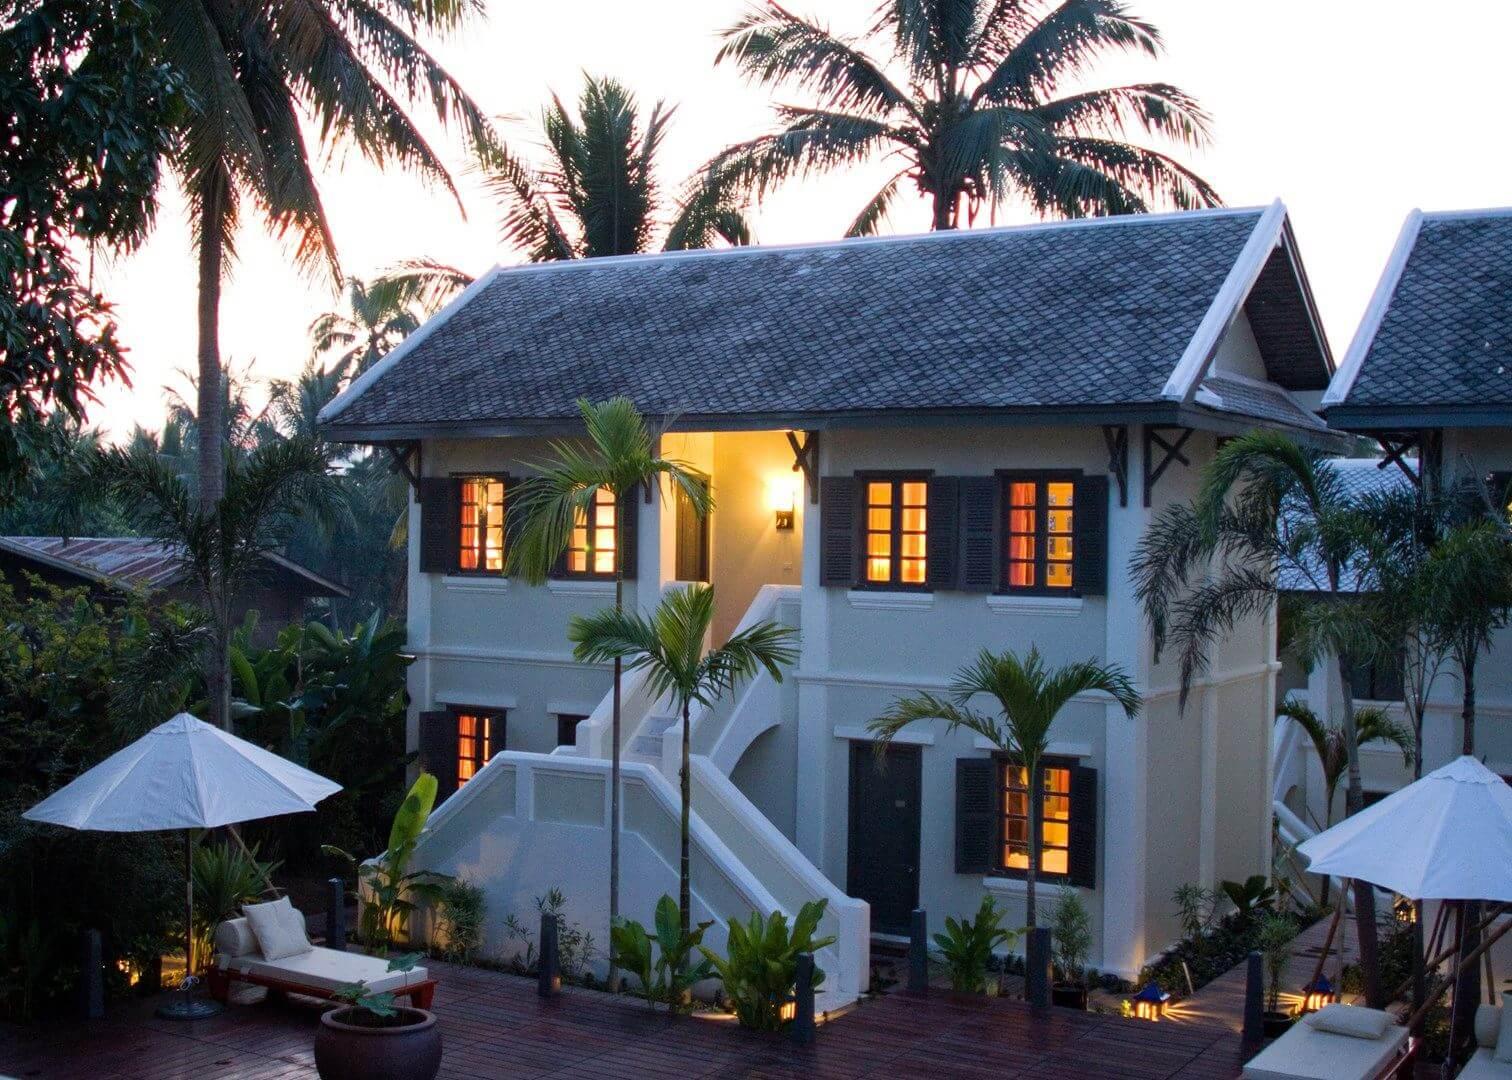 4 Star Hotels & Resorts in Luang Prabang 1